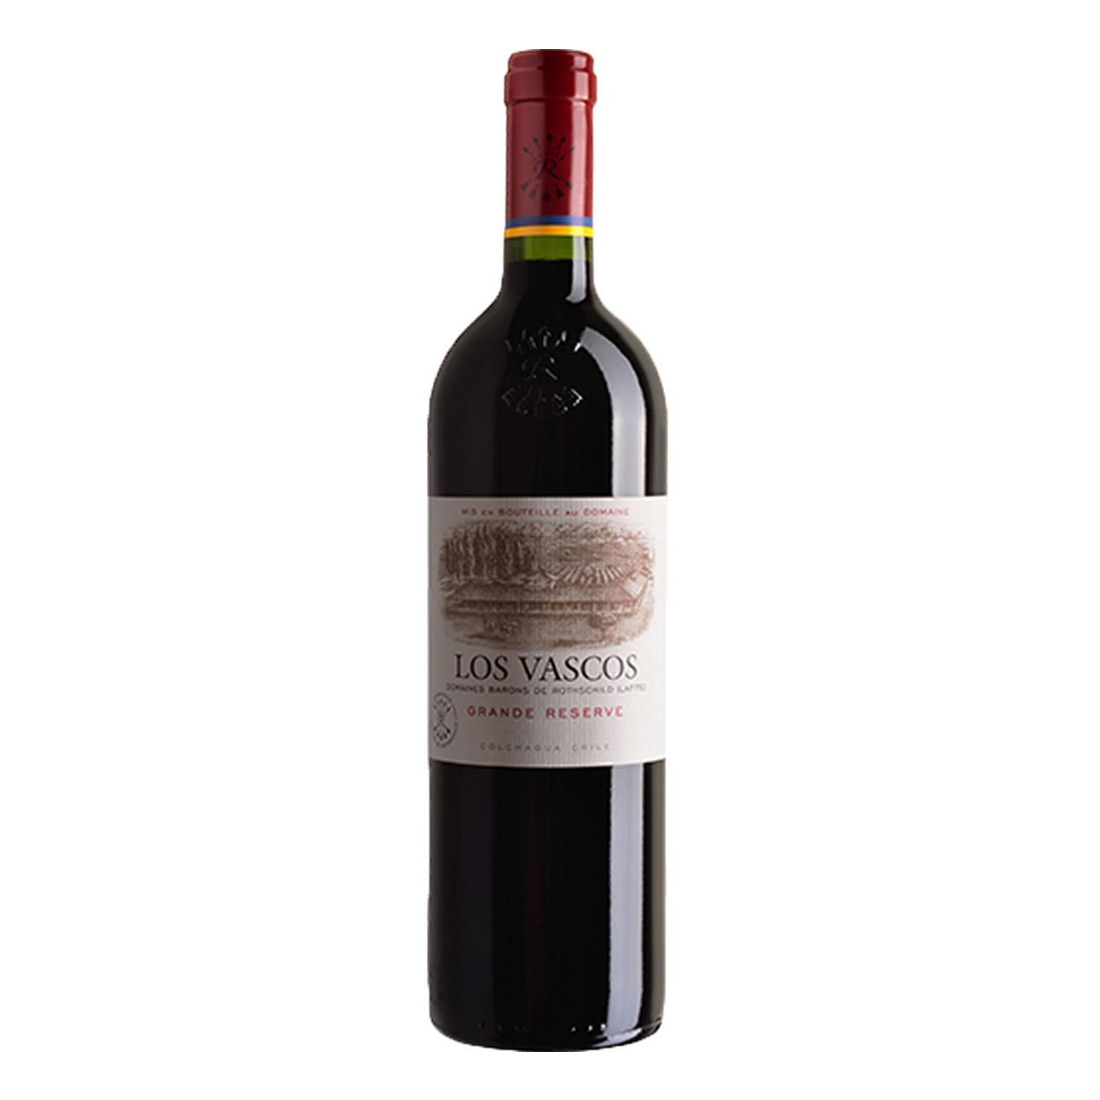 Vinho Los Vascos Grande Reserva Cabernet Sauvignon 750 ml